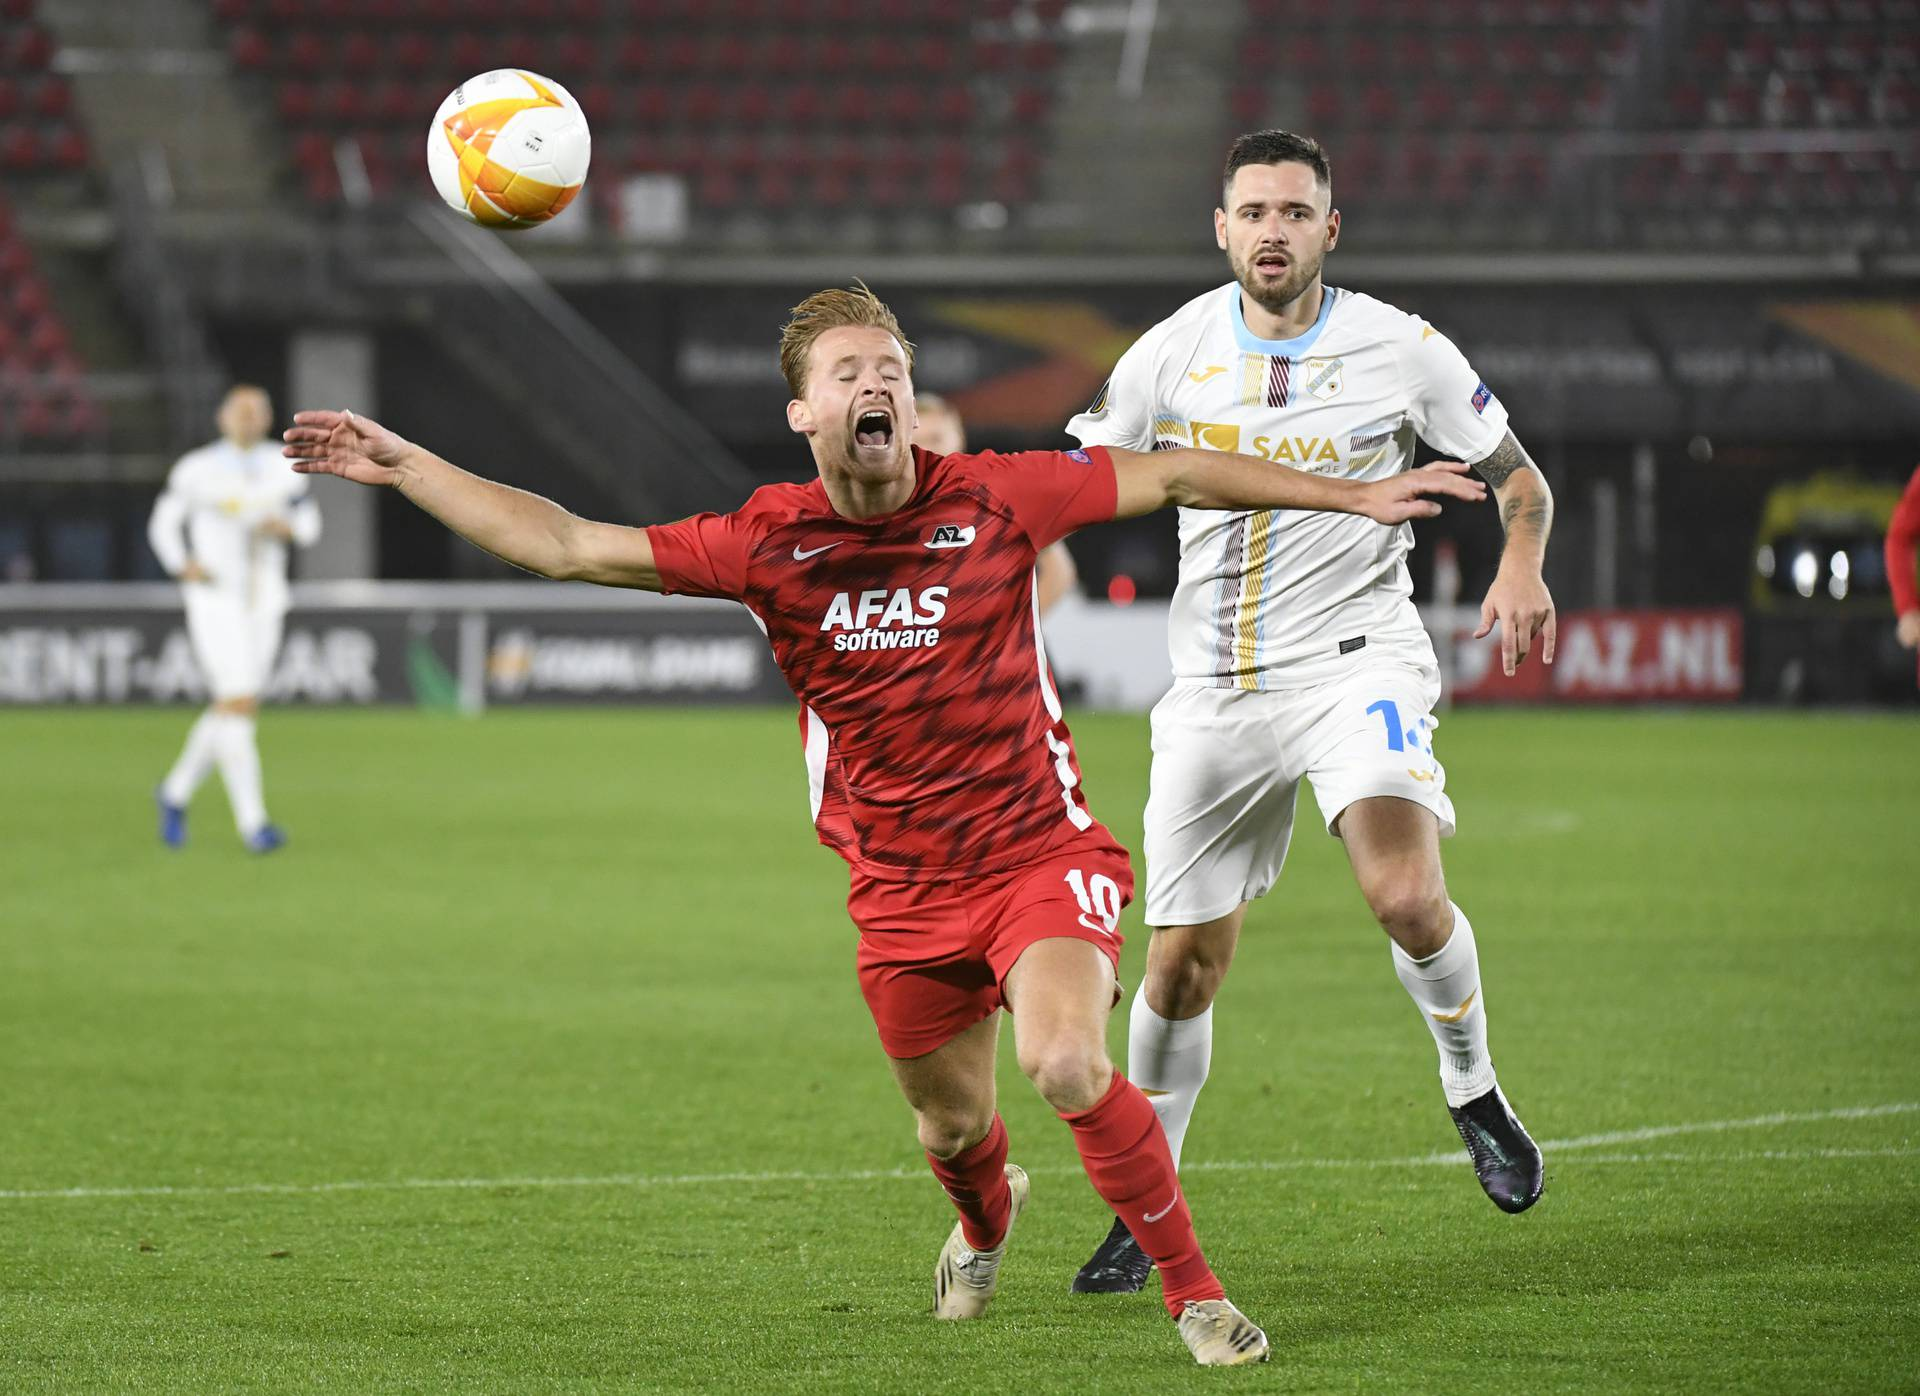 Europa League - Group F - AZ Alkmaar v HNK Rijeka